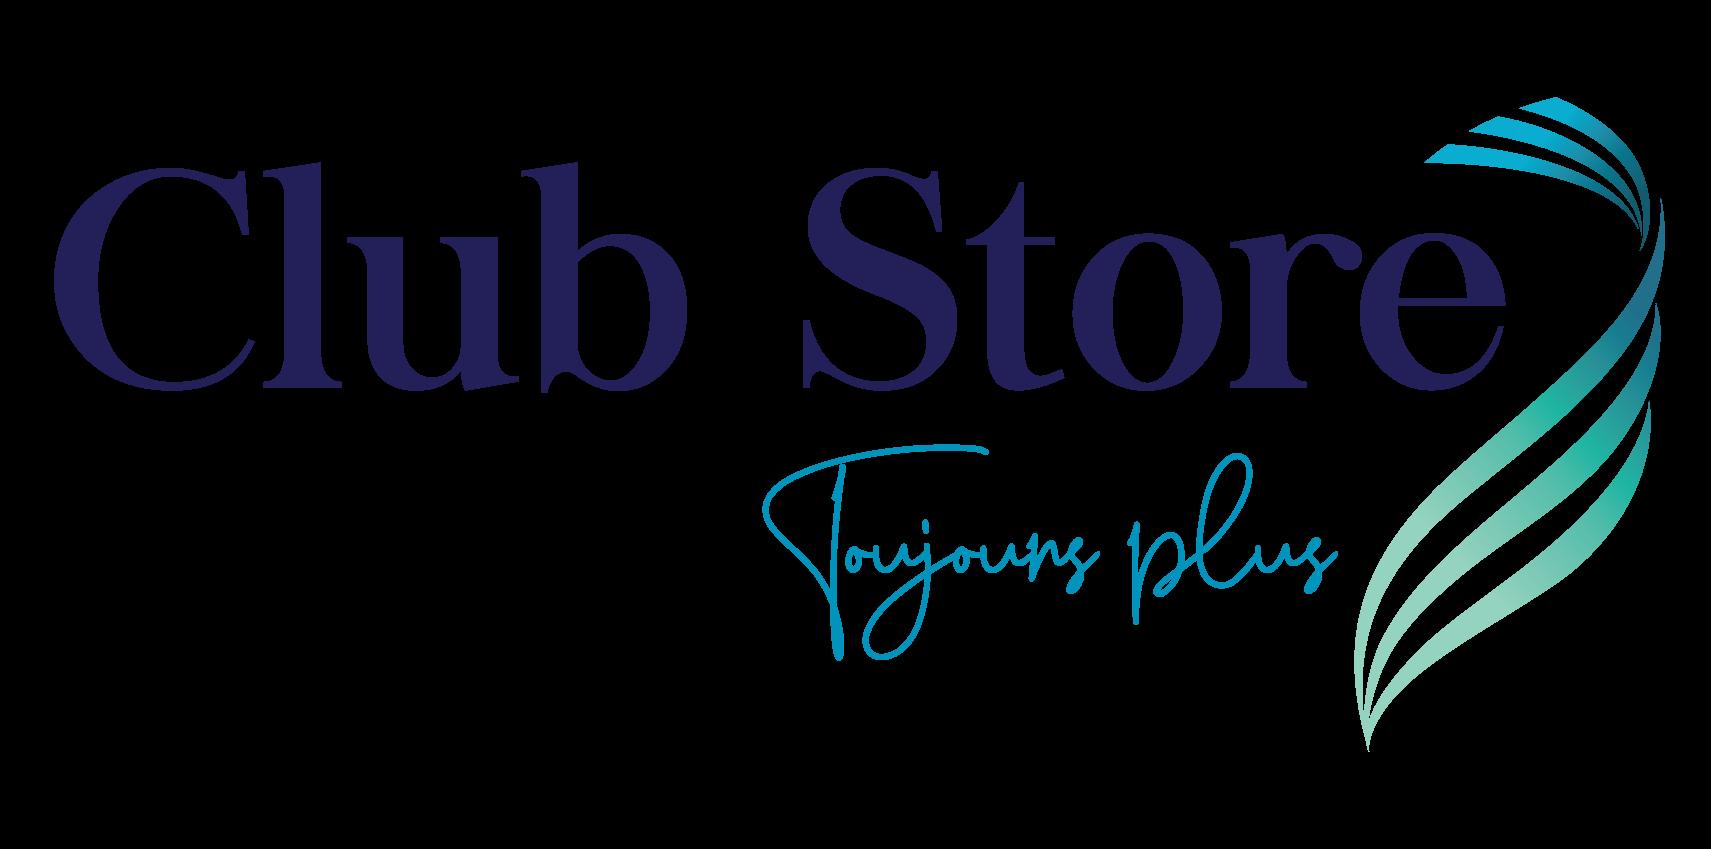 Club Store